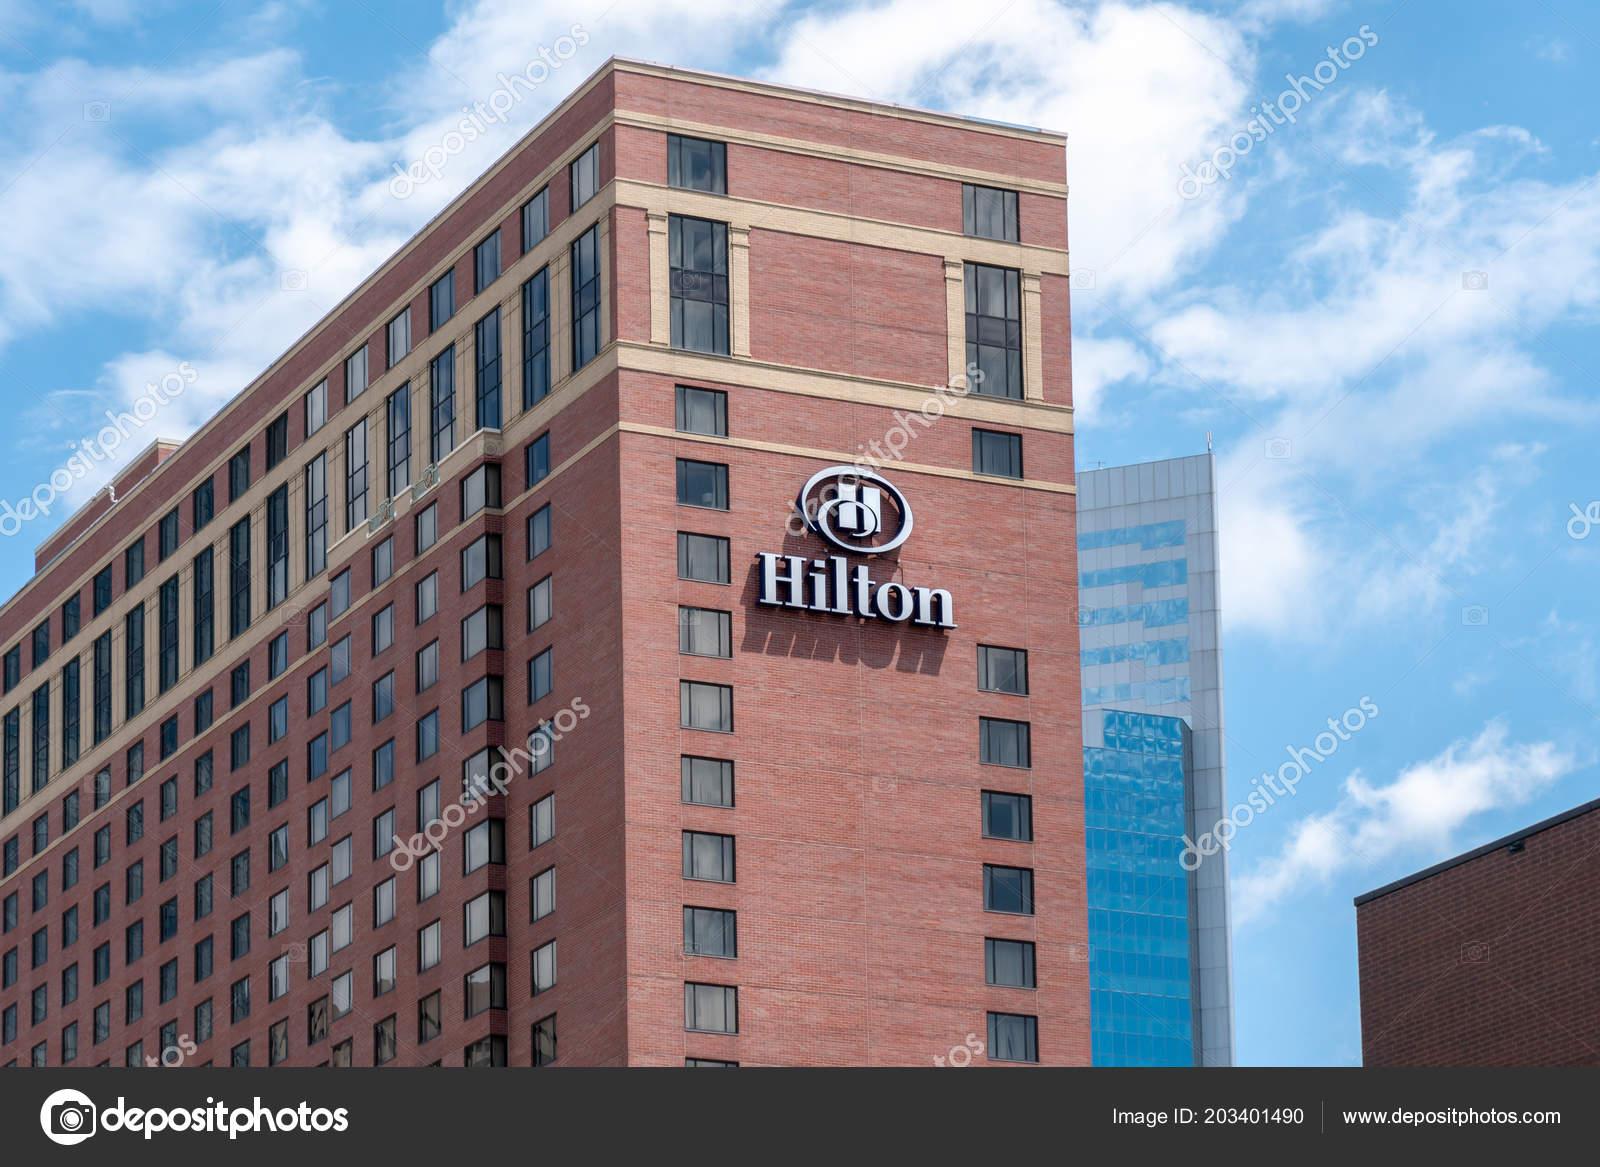 Minneapolis Usa June 2018 Hilton Hotel Exterior Trademark Logo